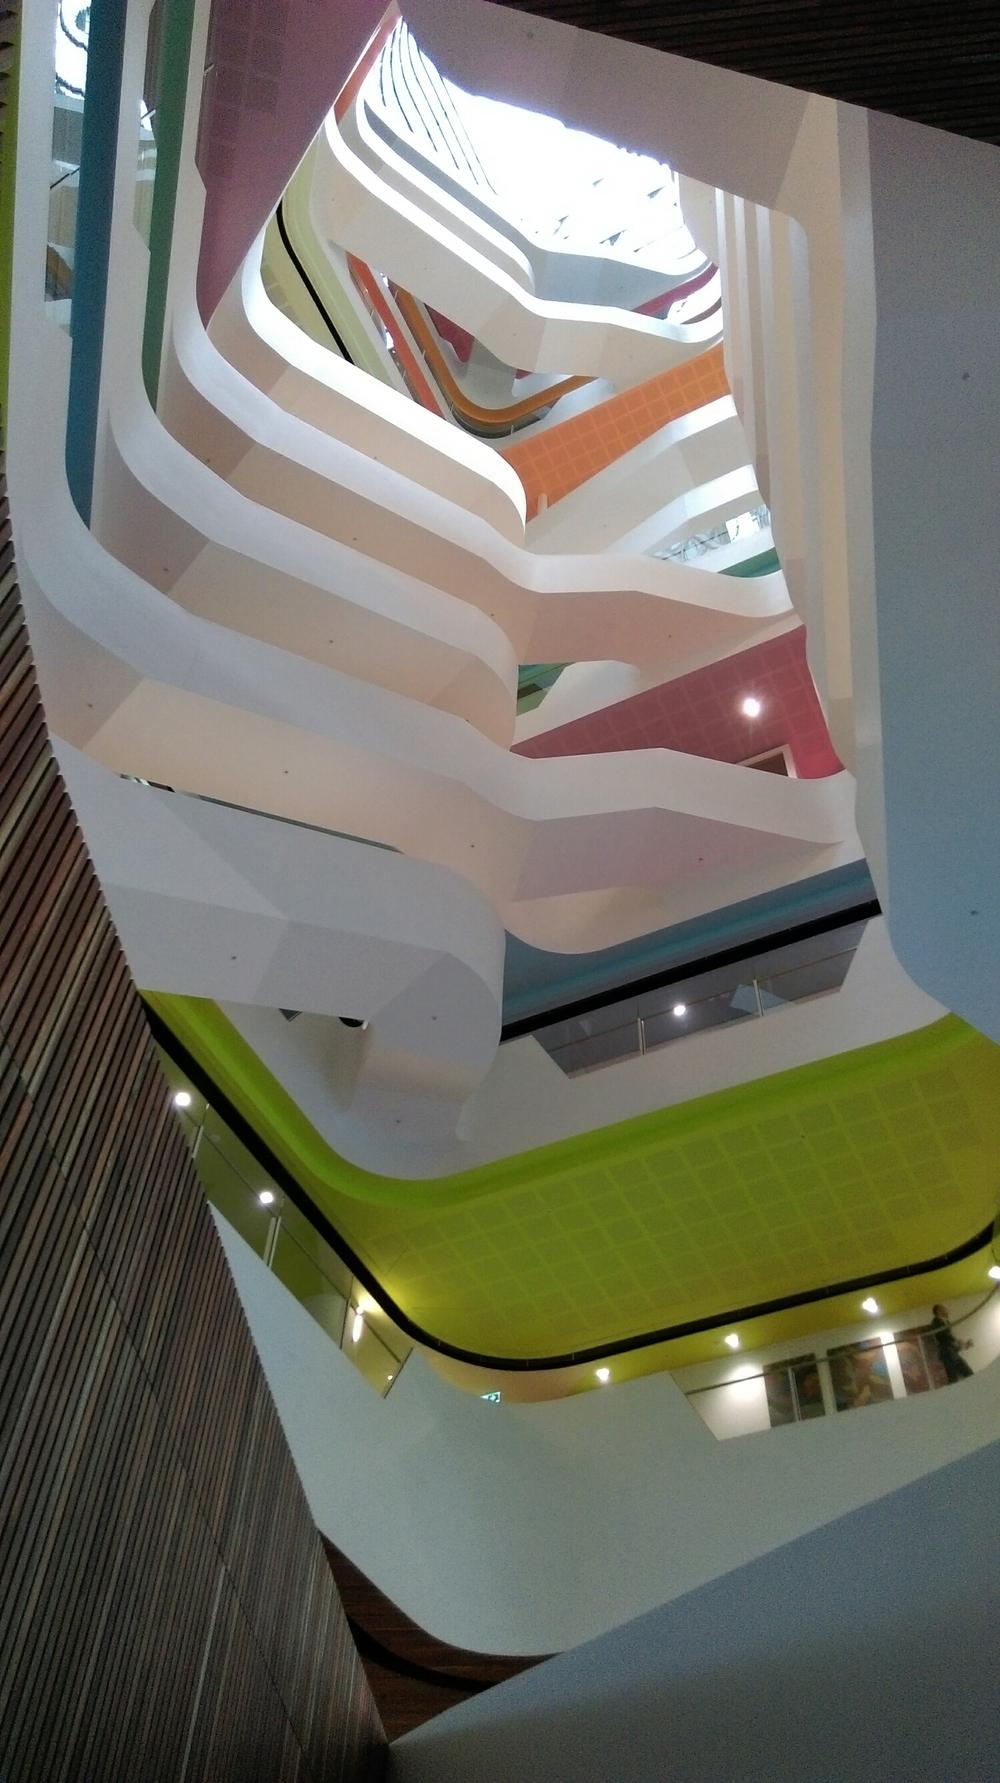 Inside Medibank.